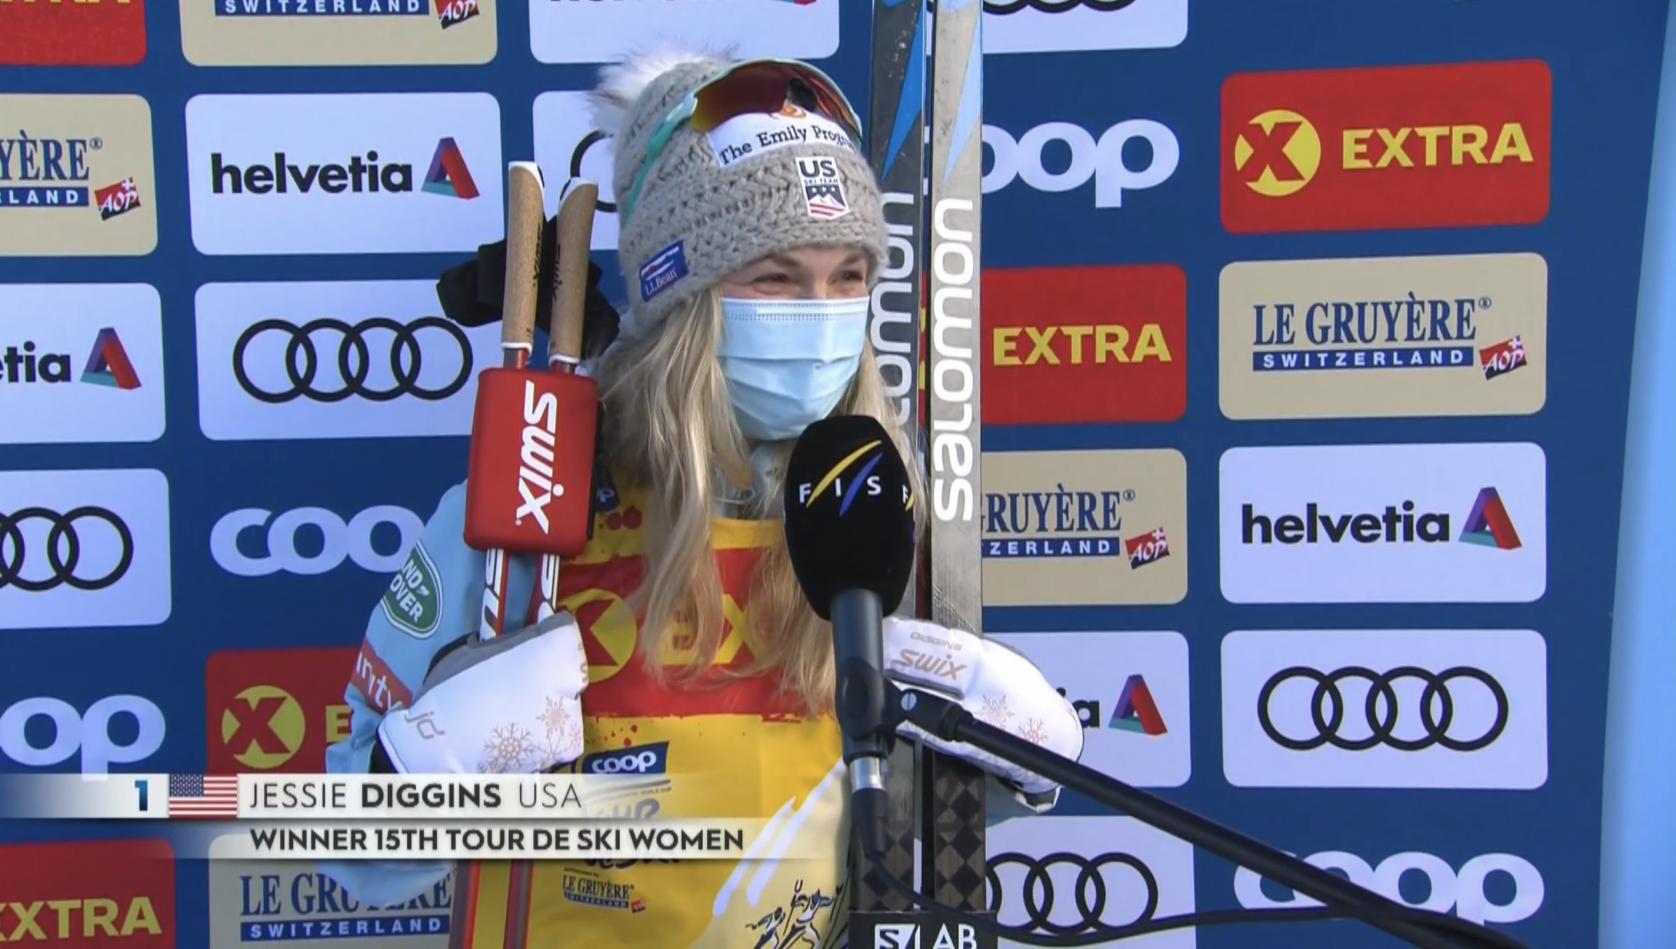 jessie diggins team usa tour de ski win 2021